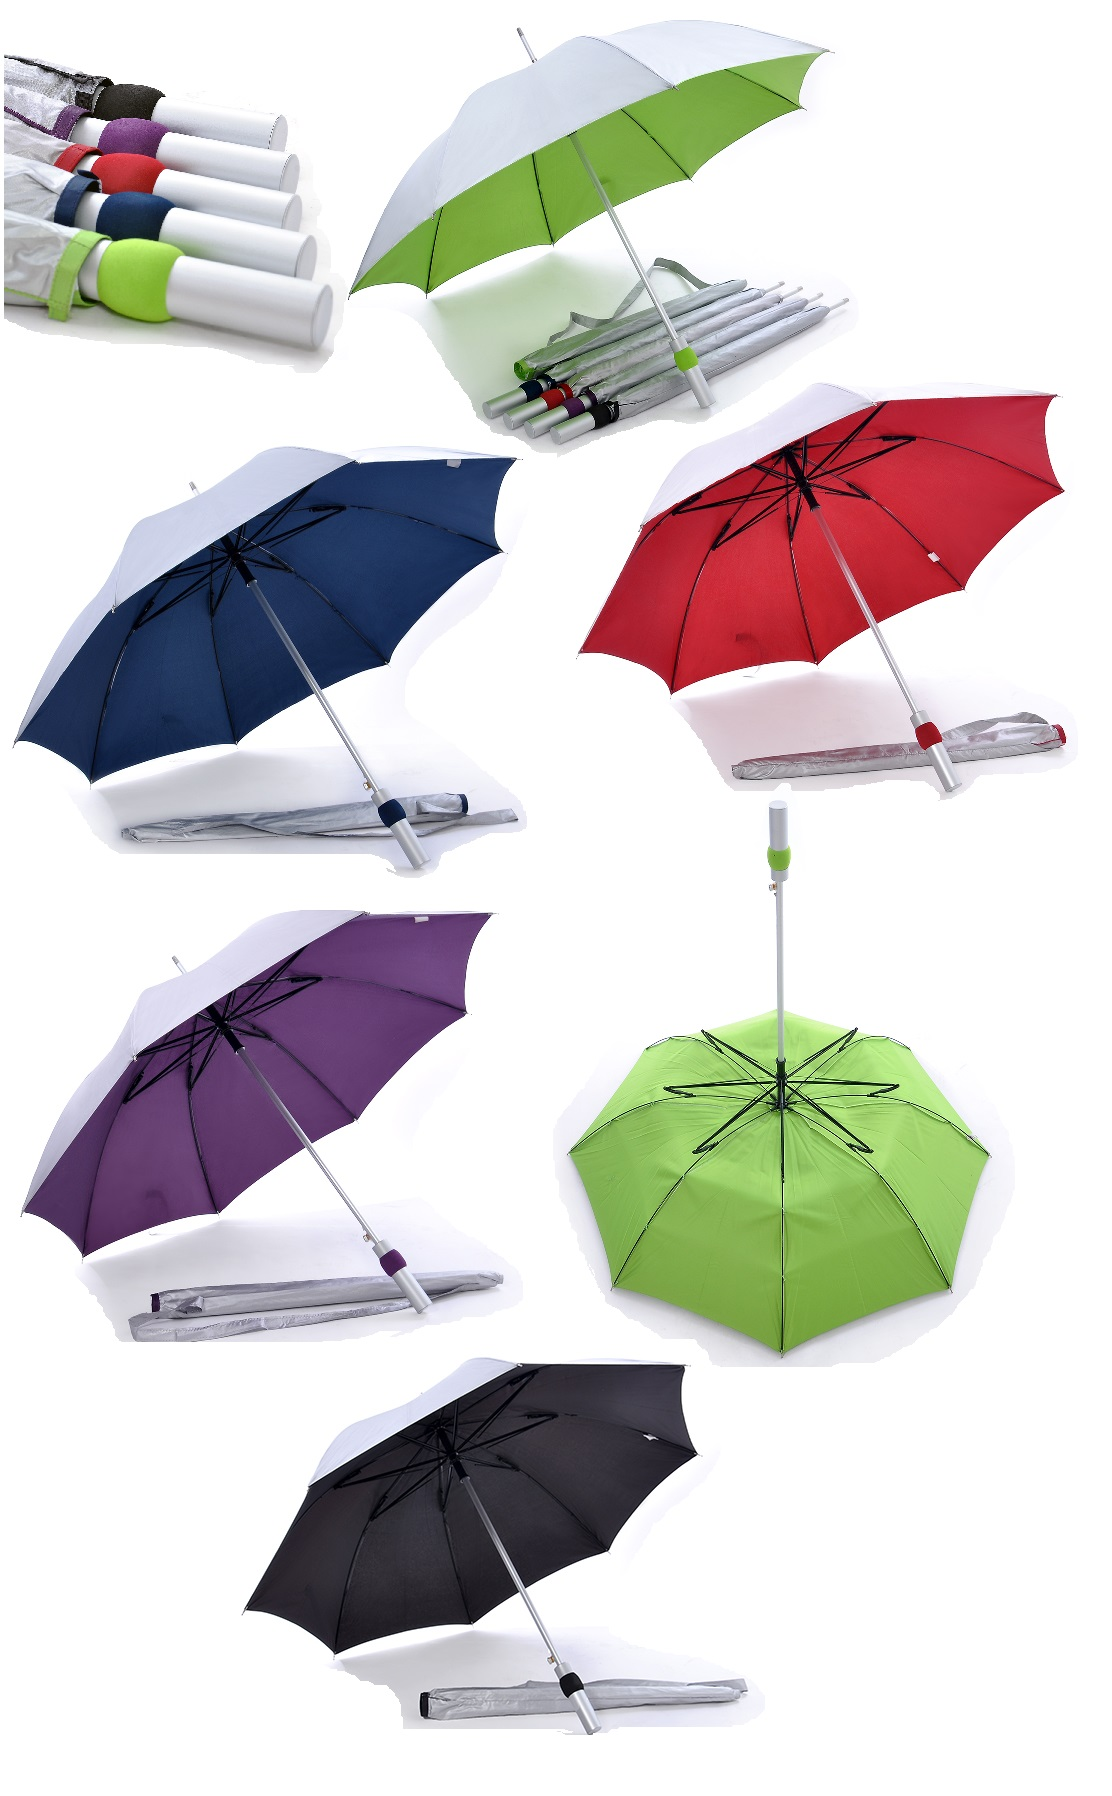 24inch Umbrella with UV Coating